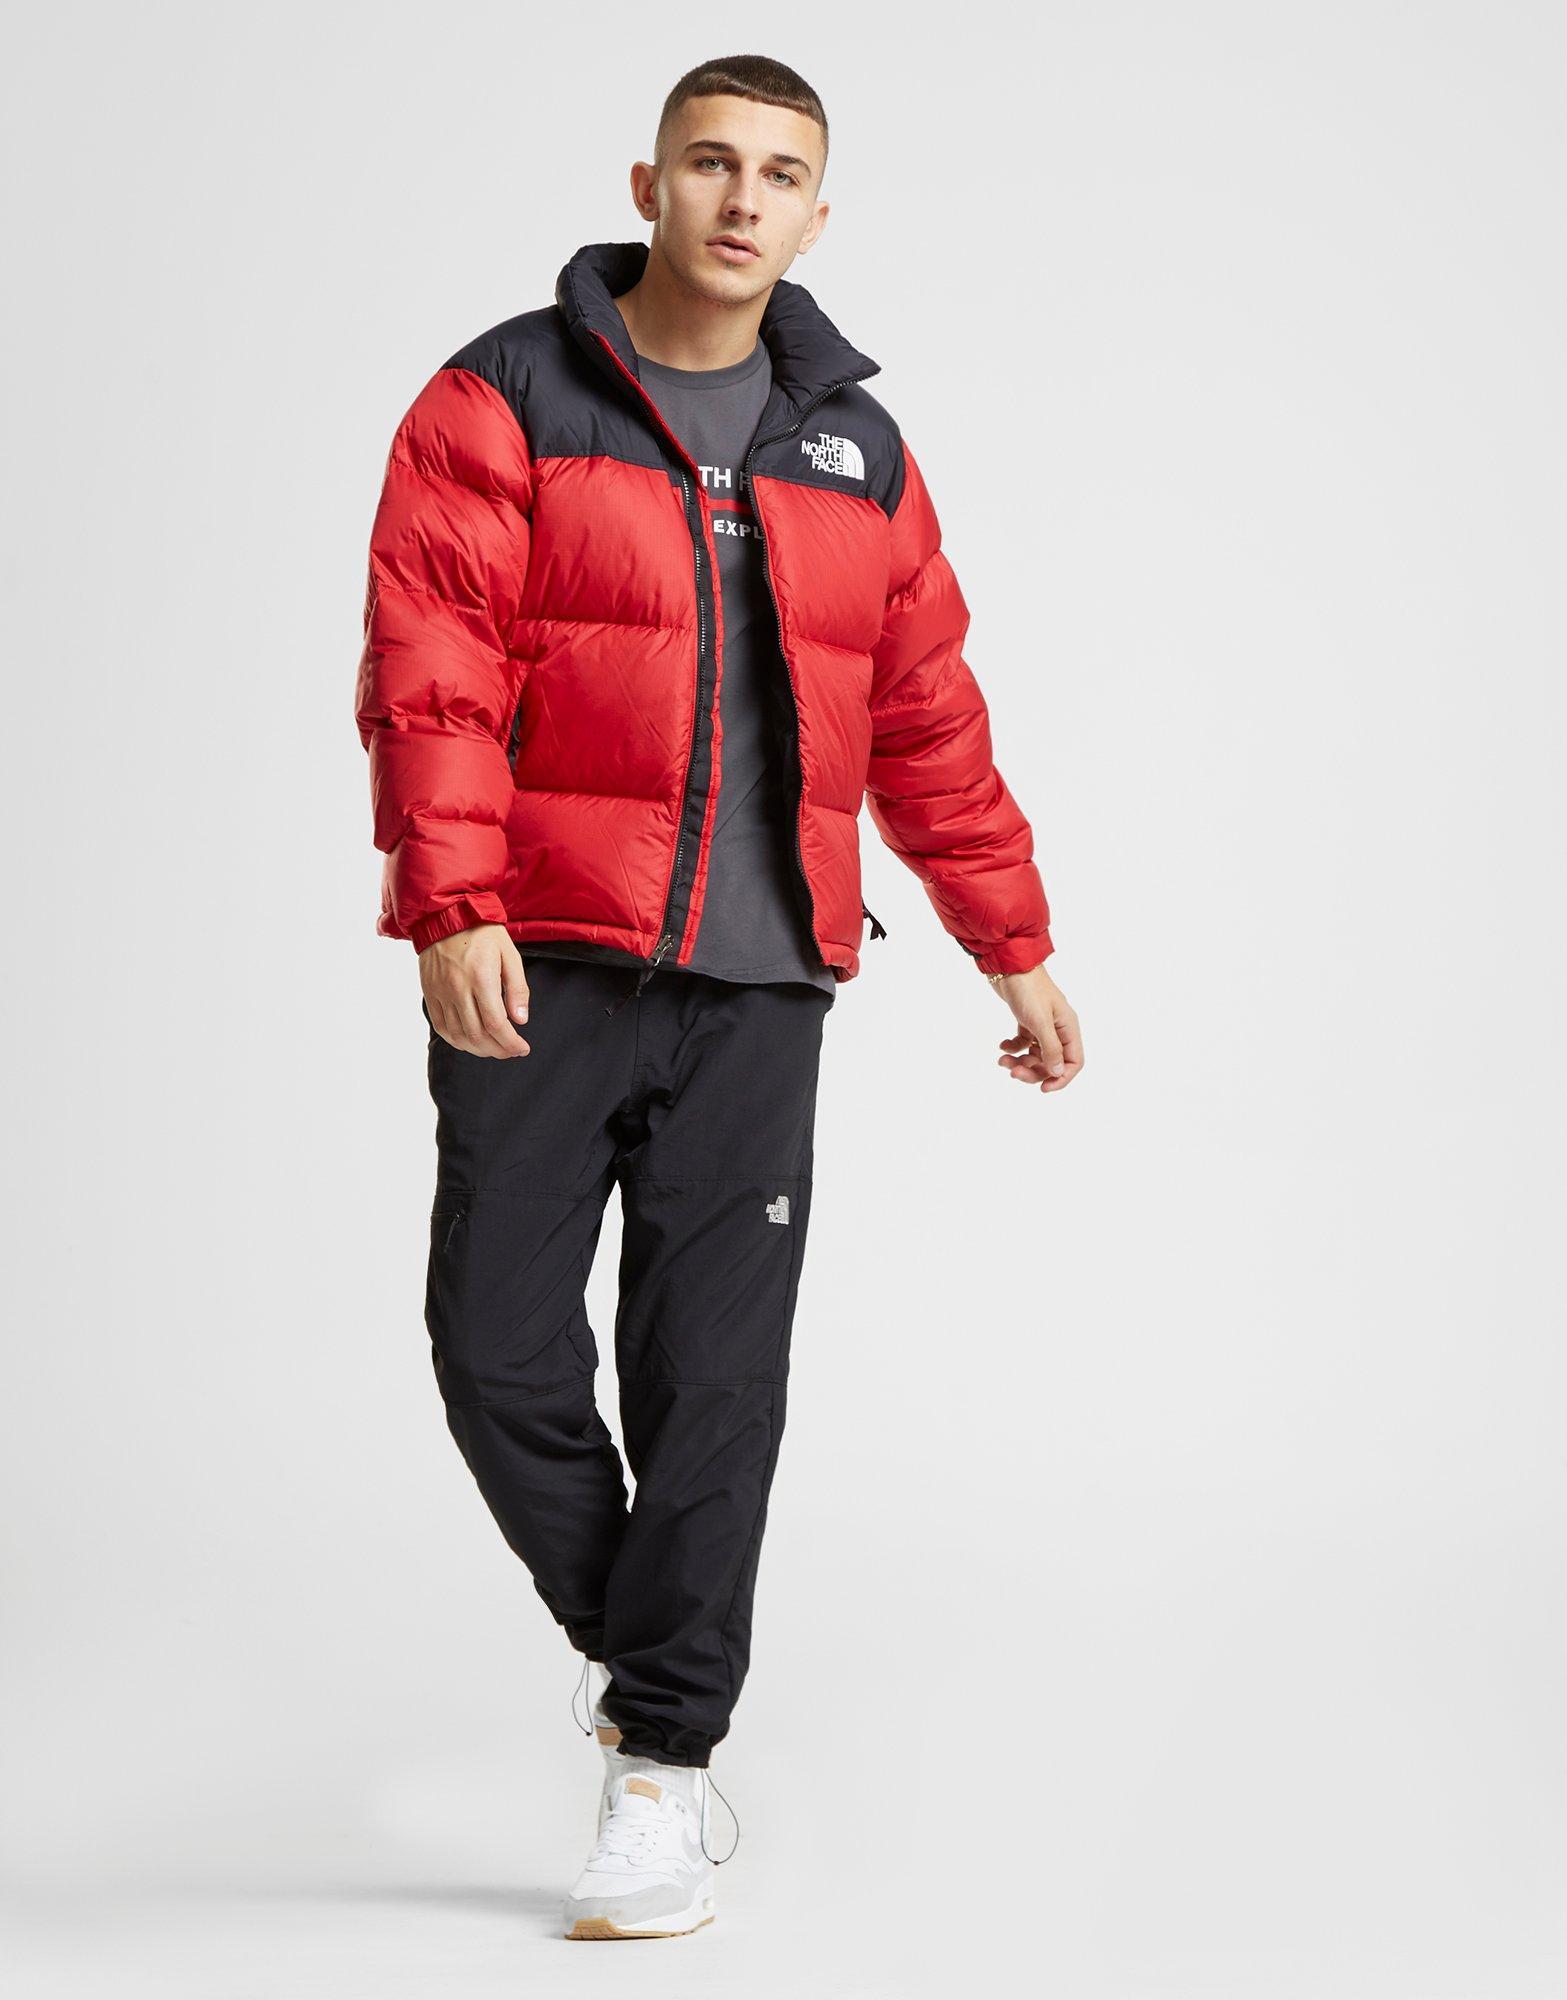 686dd49667 Mens Nuptse Bib Black online store 69834 eede0  Lyst - The North Face Nuptse  1996 Jacket in Red for Men - Save 12.269938650306742% ...